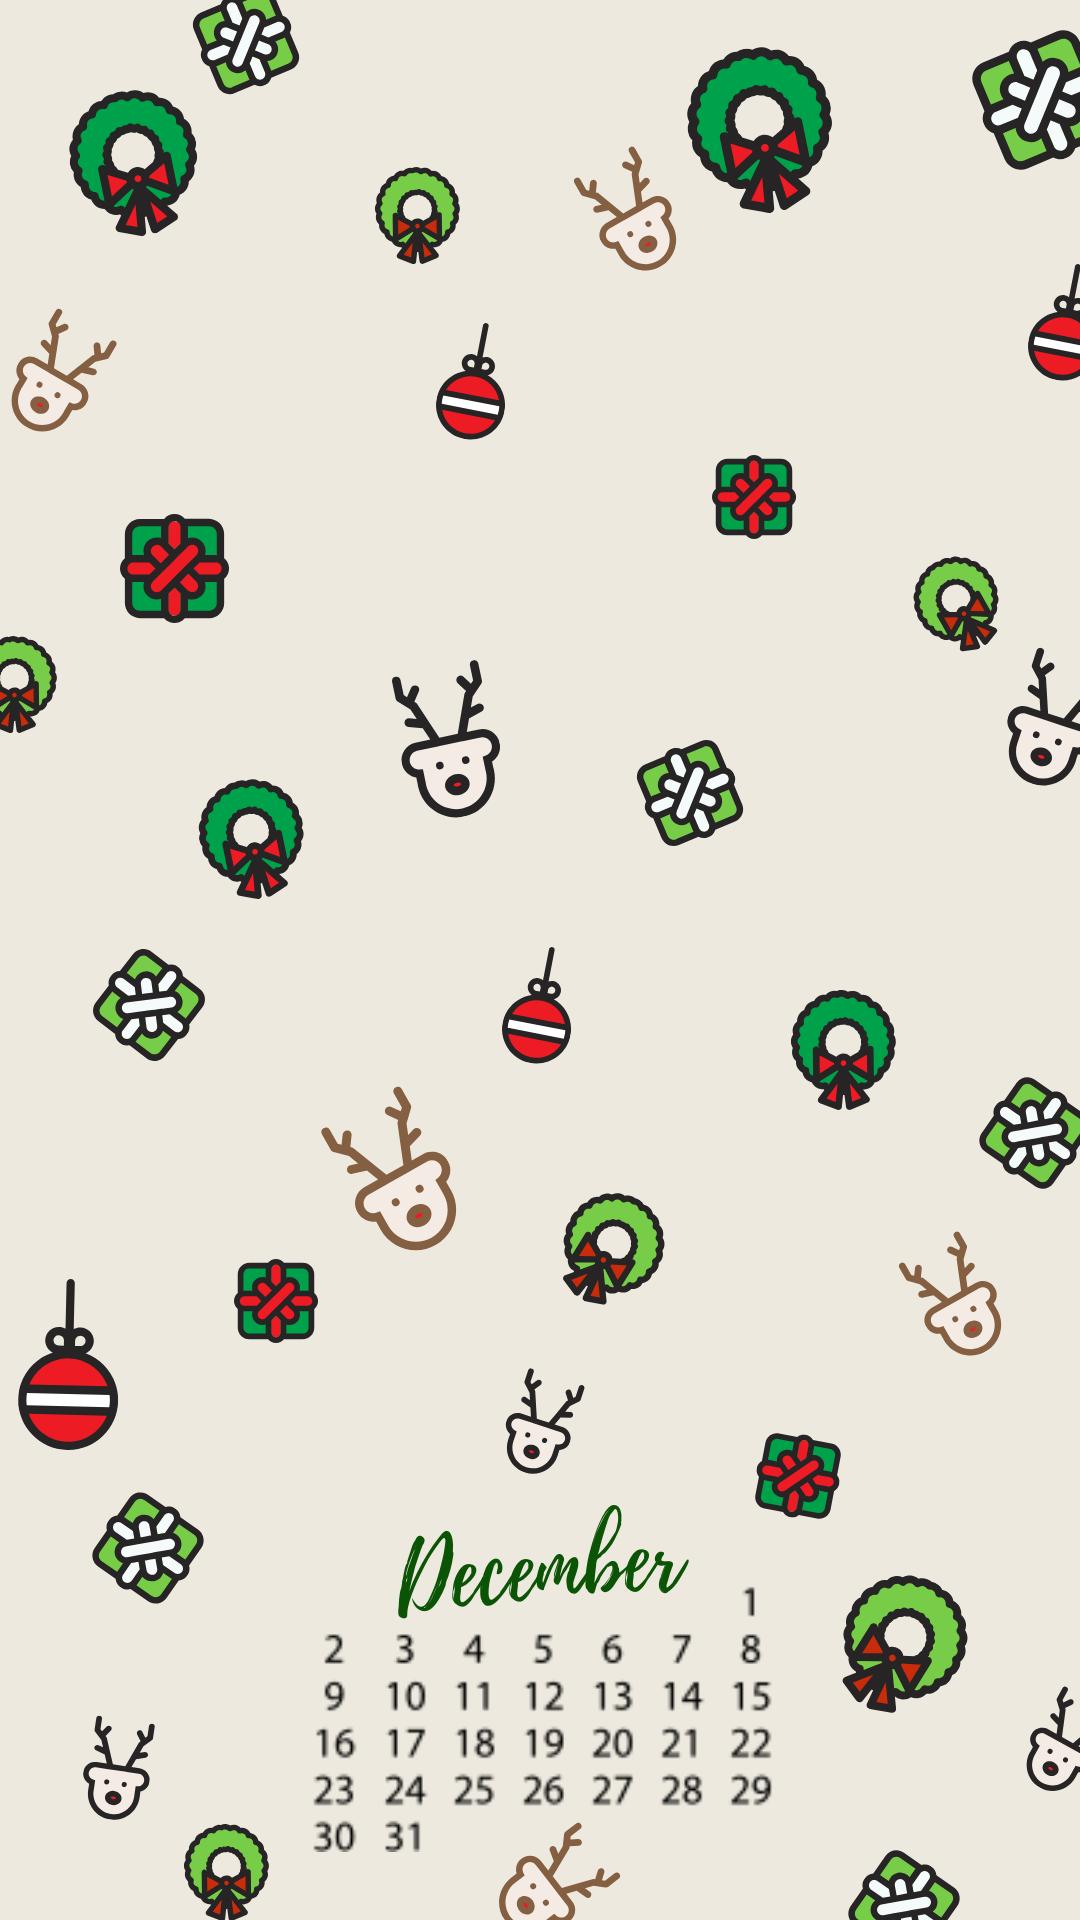 December Christmas Iphone Background Calendar Christmas Phone Wallpaper Christmas Background Iphone Snowflake Wallpaper